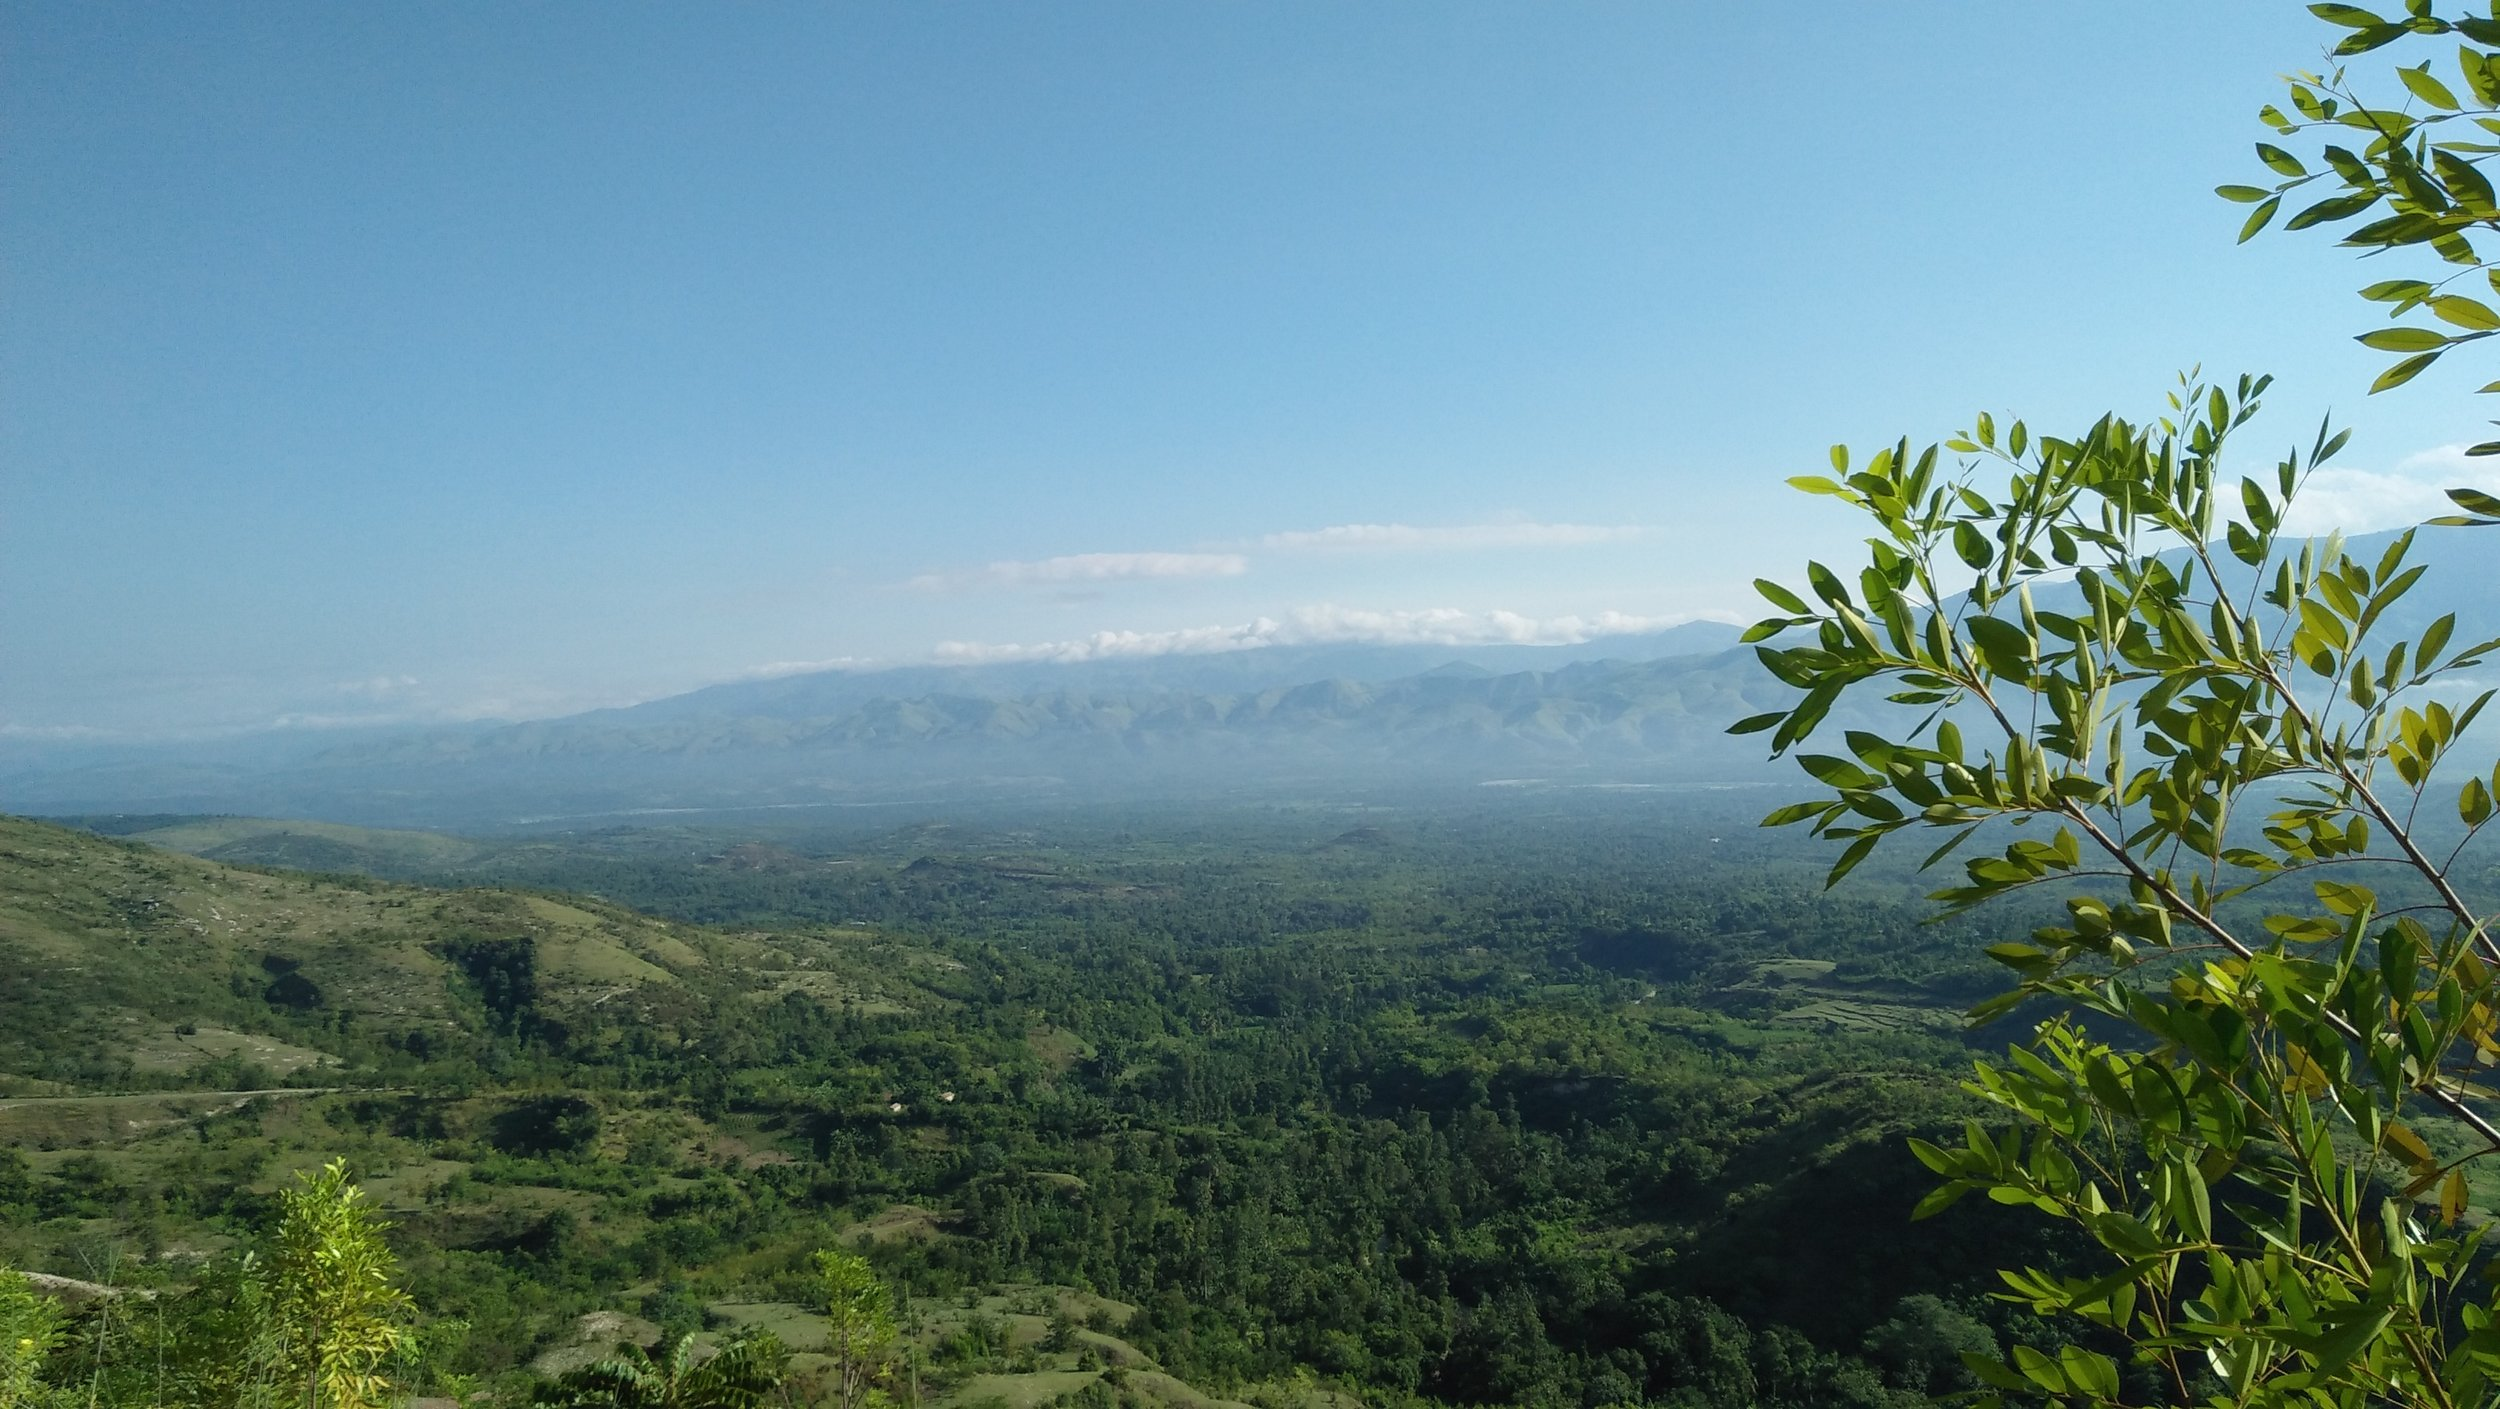 A view into the Artibonite Valley near Desarmes.